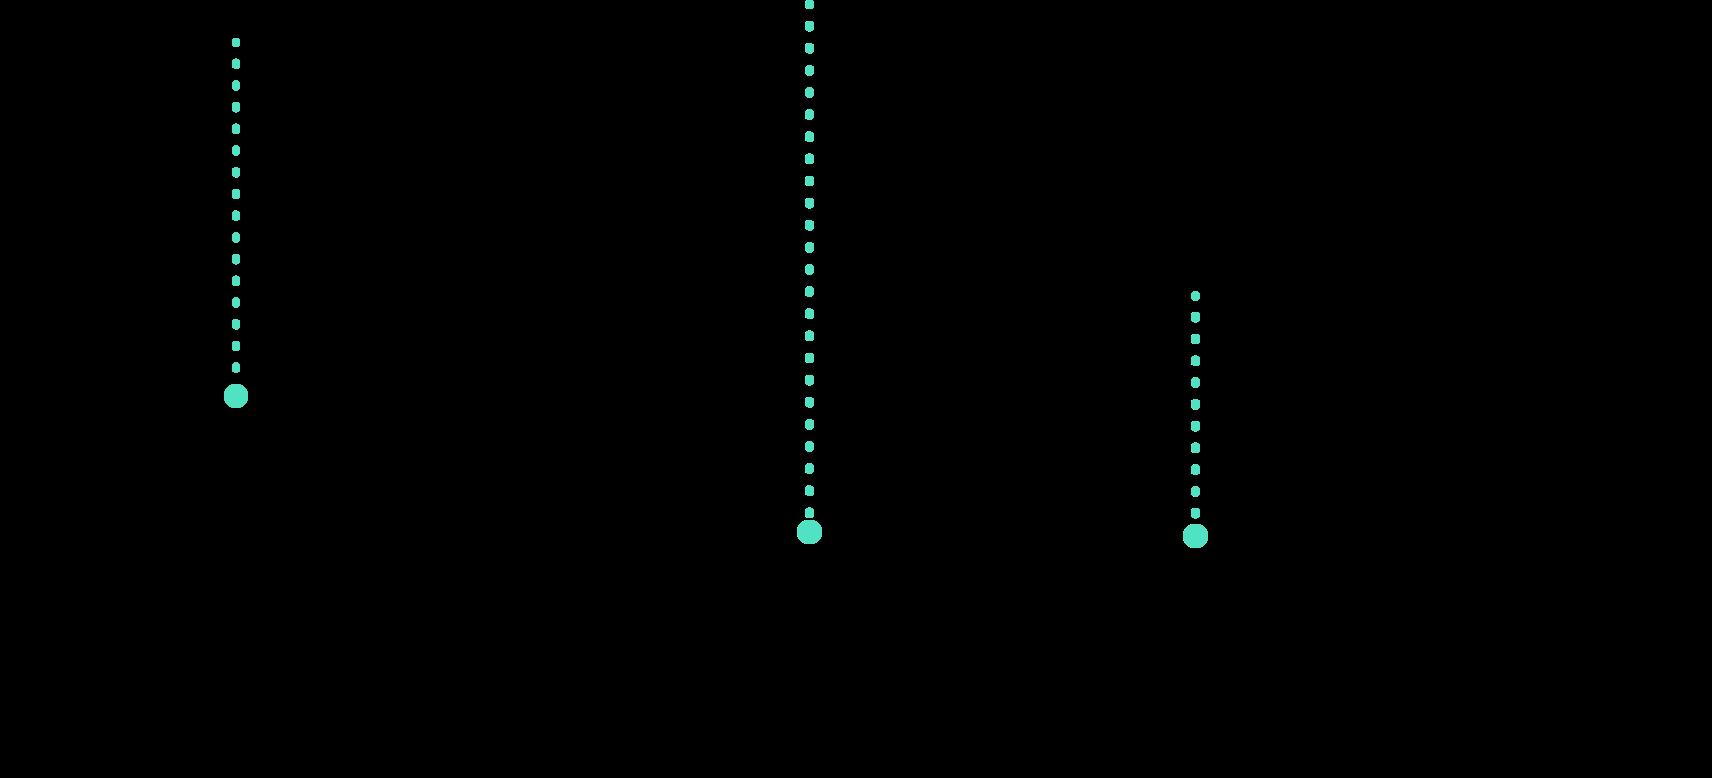 Step 3 - Lines